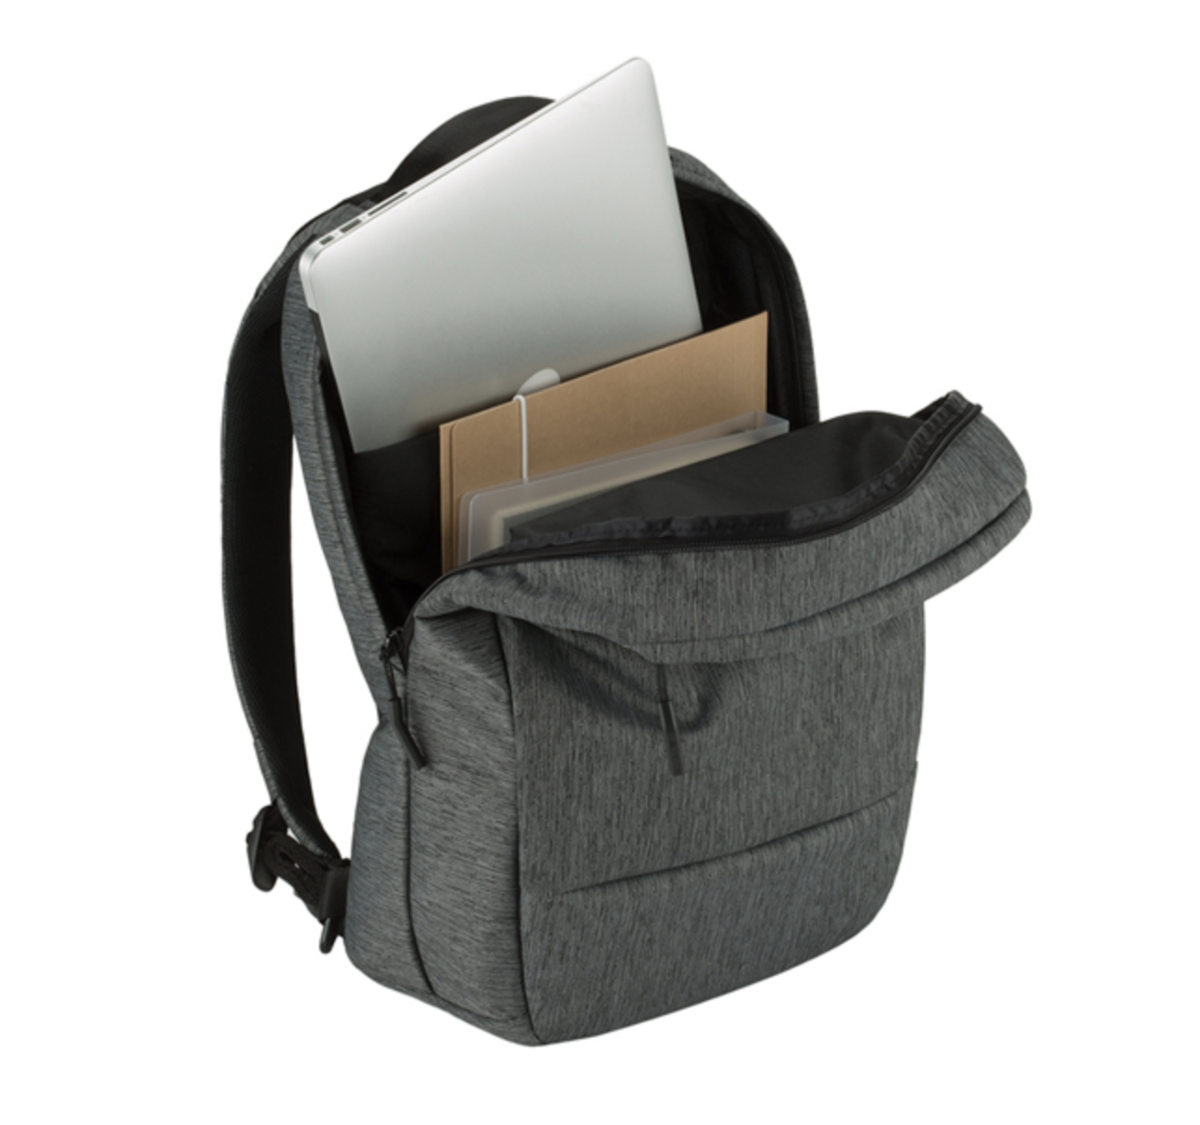 f:id:thebackpack:20190822182850p:plain